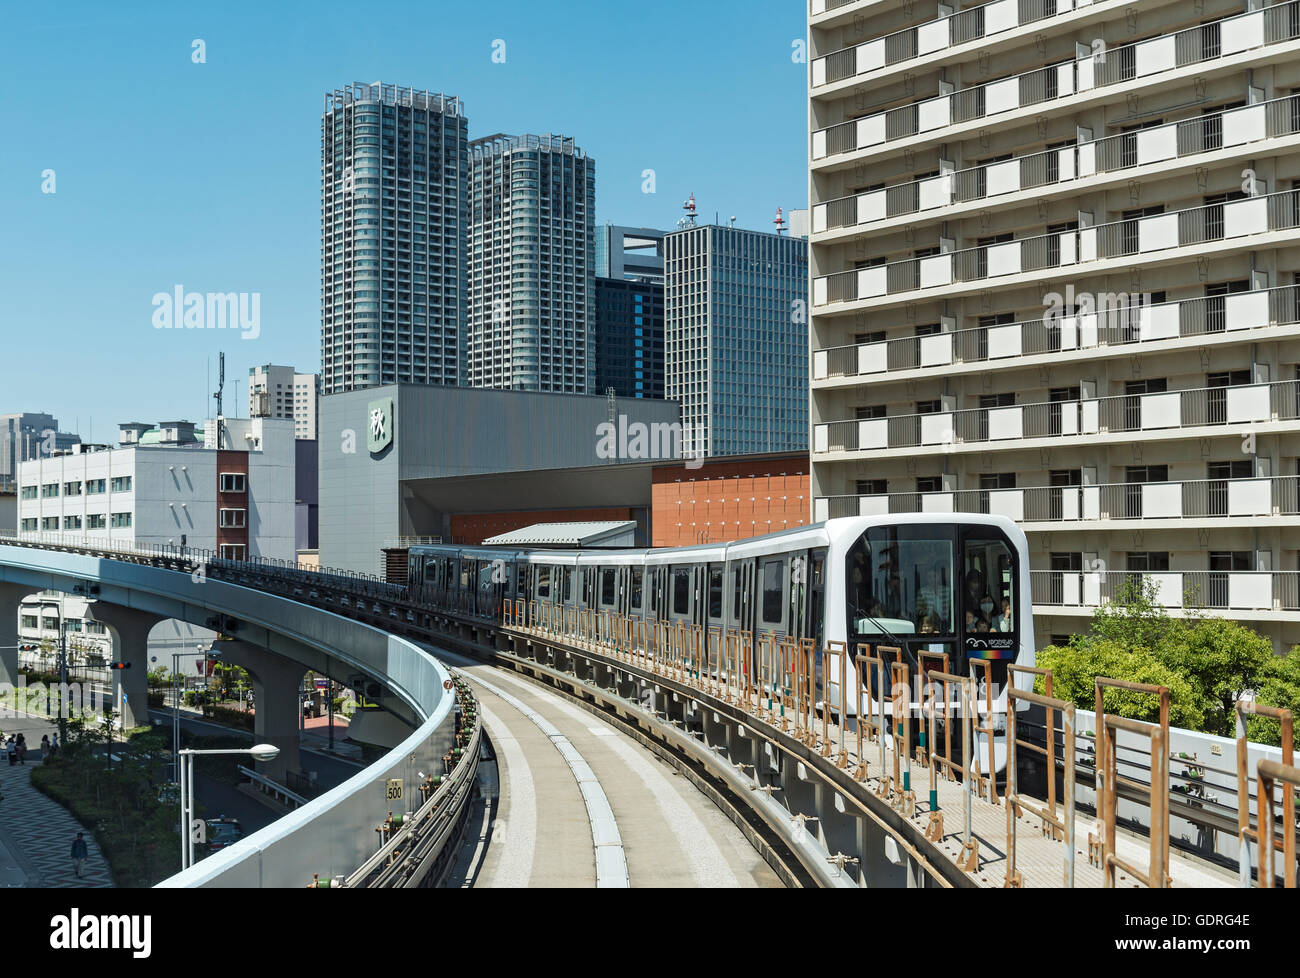 Yurikamome automated train in Daiba, Odaiba, Tokyo, Japan - Stock Image